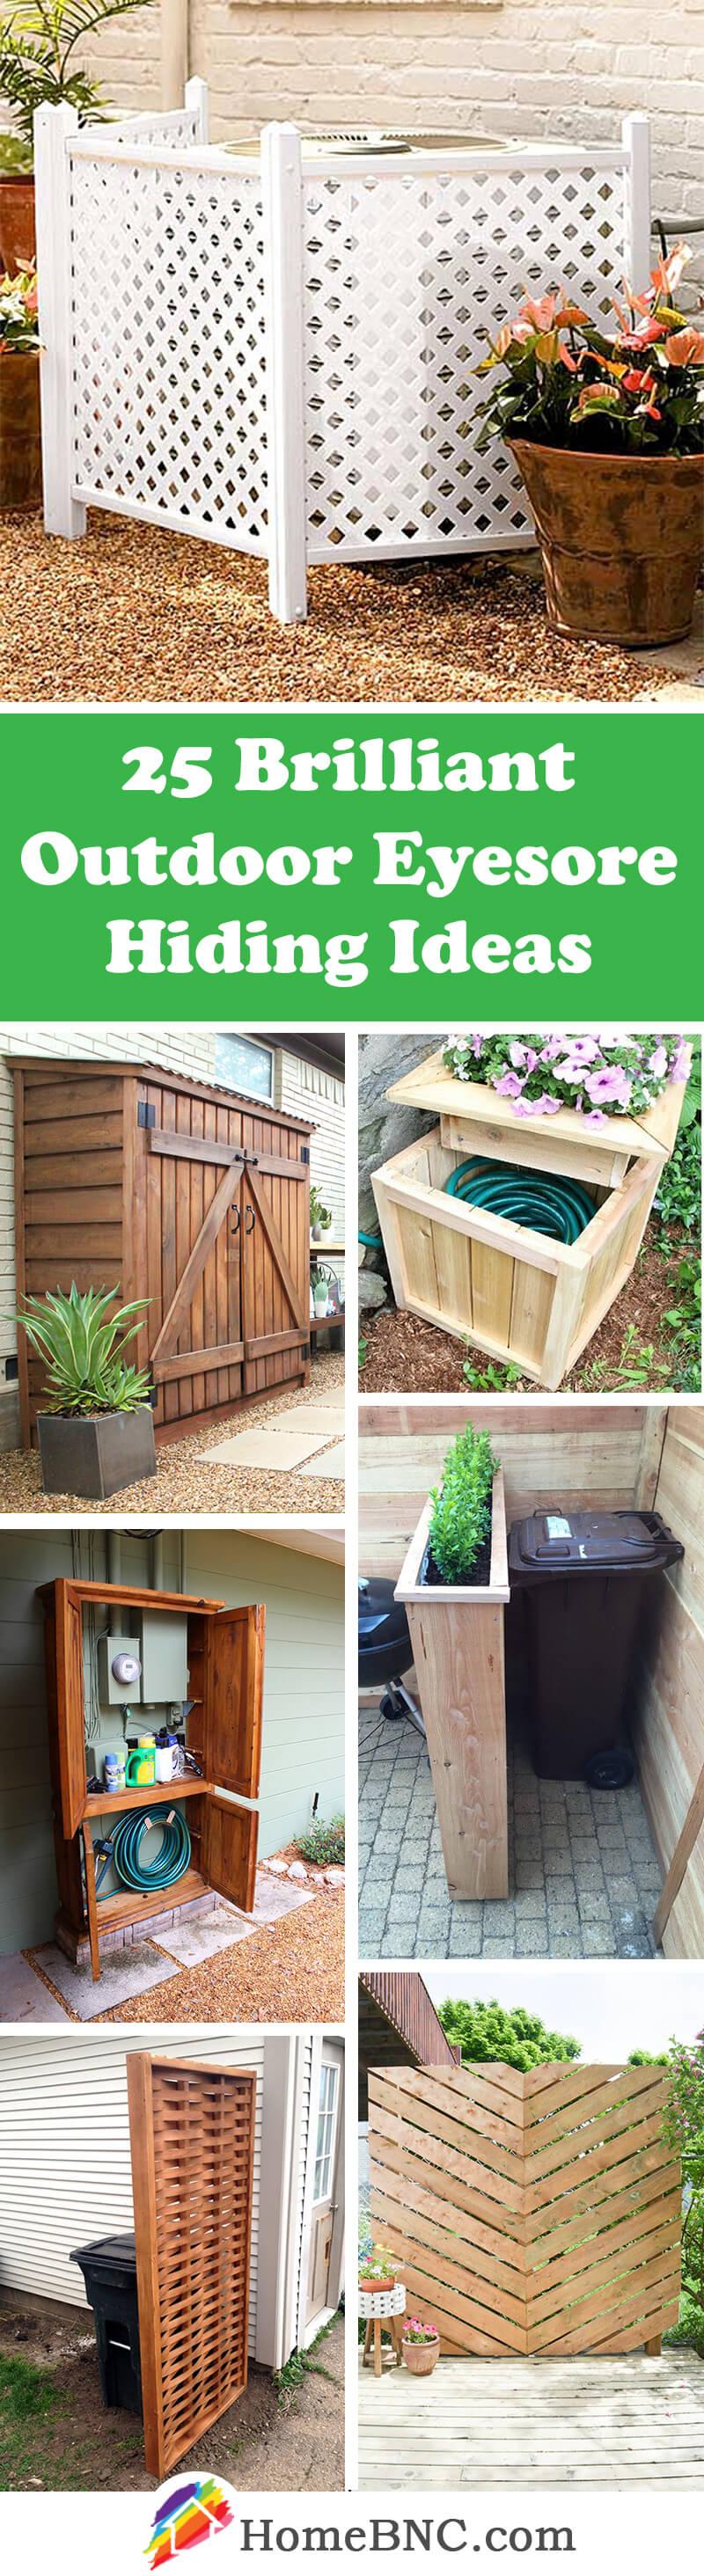 25 best outdoor eyesore hiding ideas